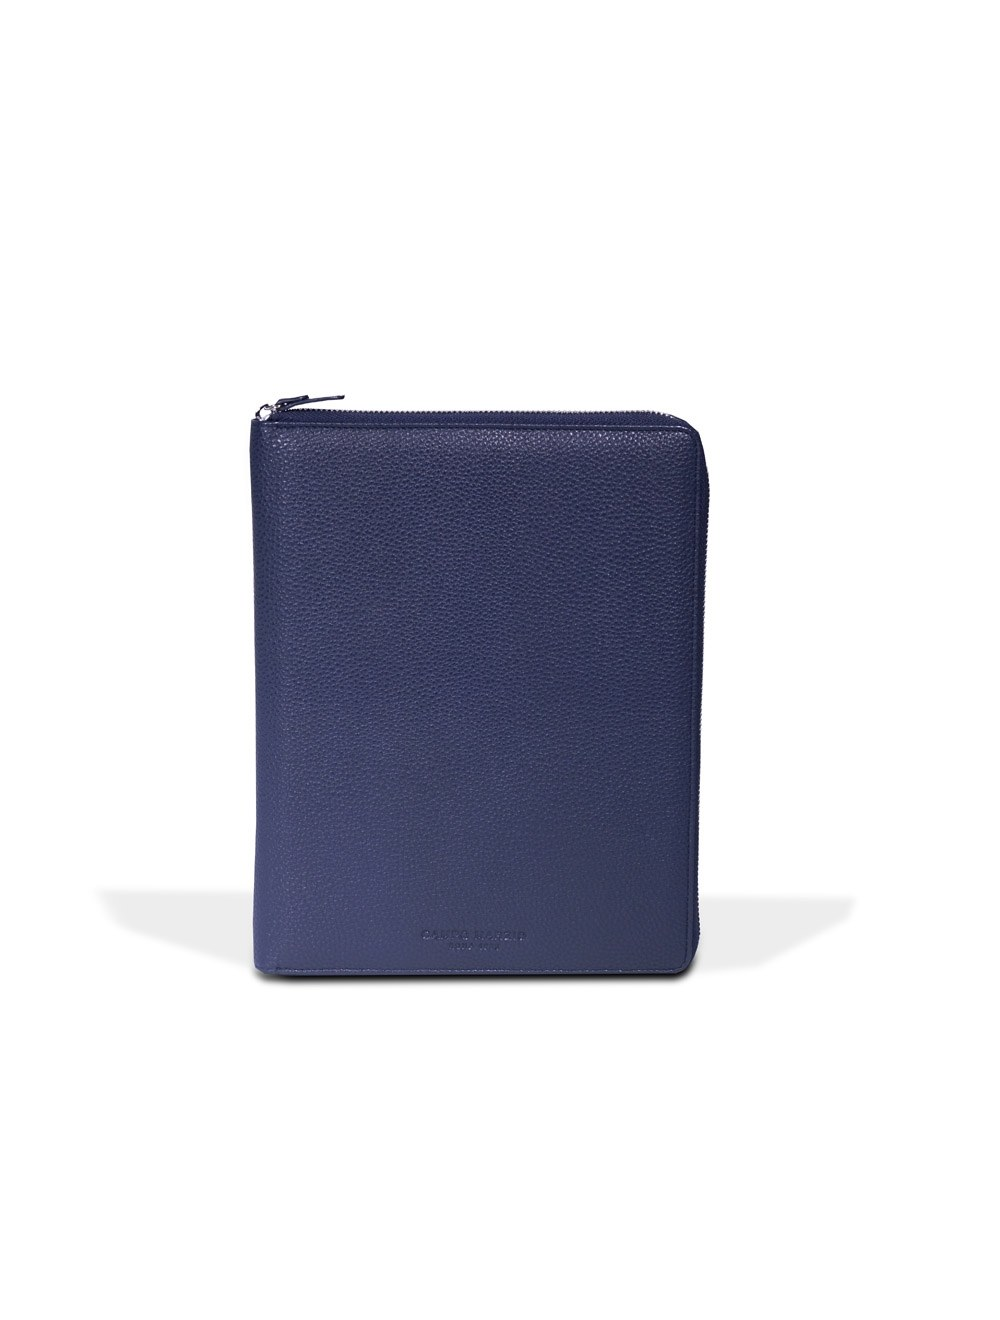 Portfolio Zip A5 - Ocean Blue